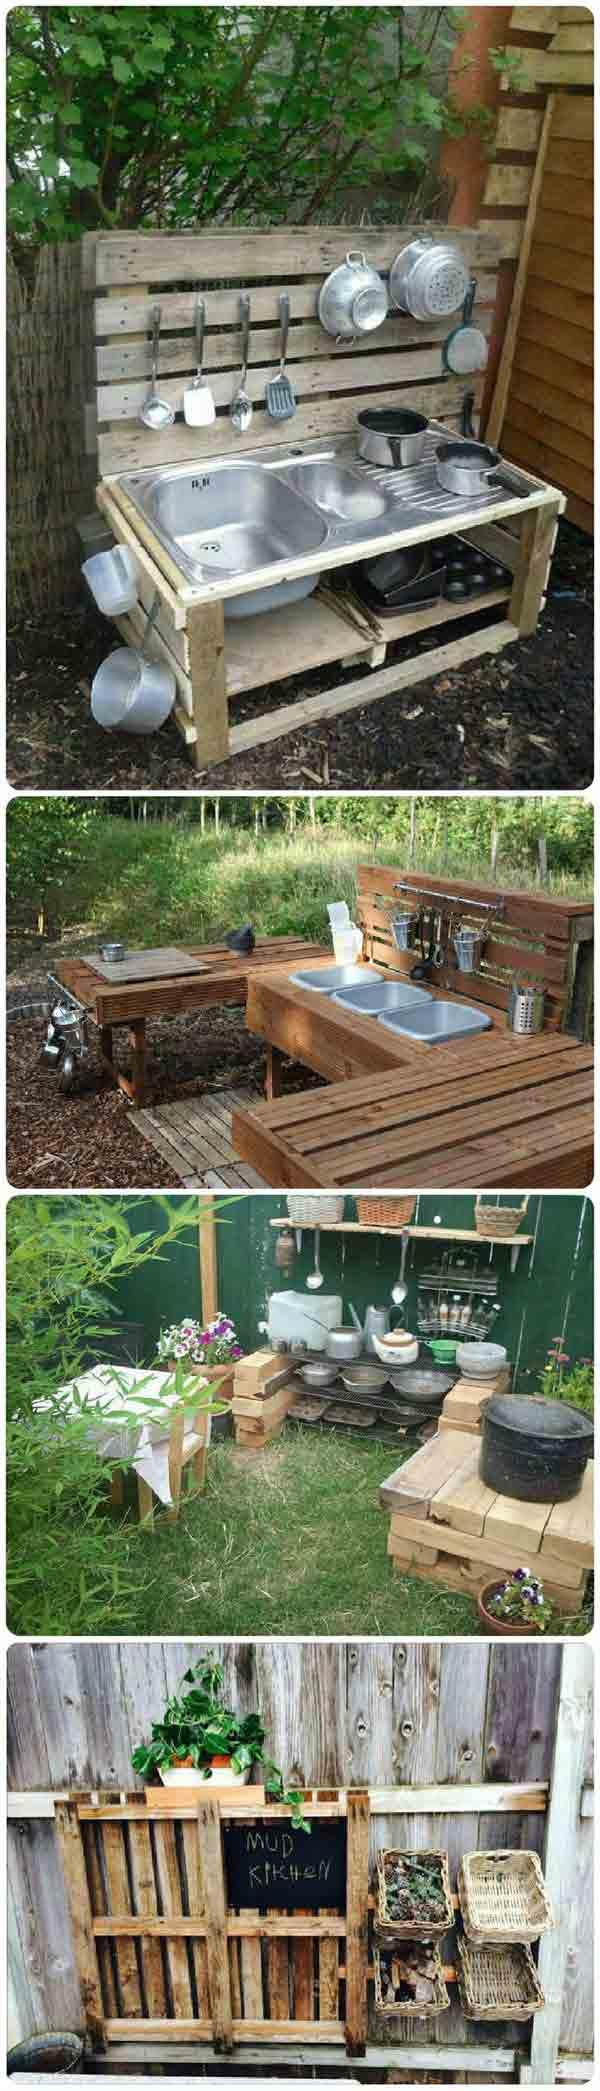 diy-backyard-projects-kid-woohome-25